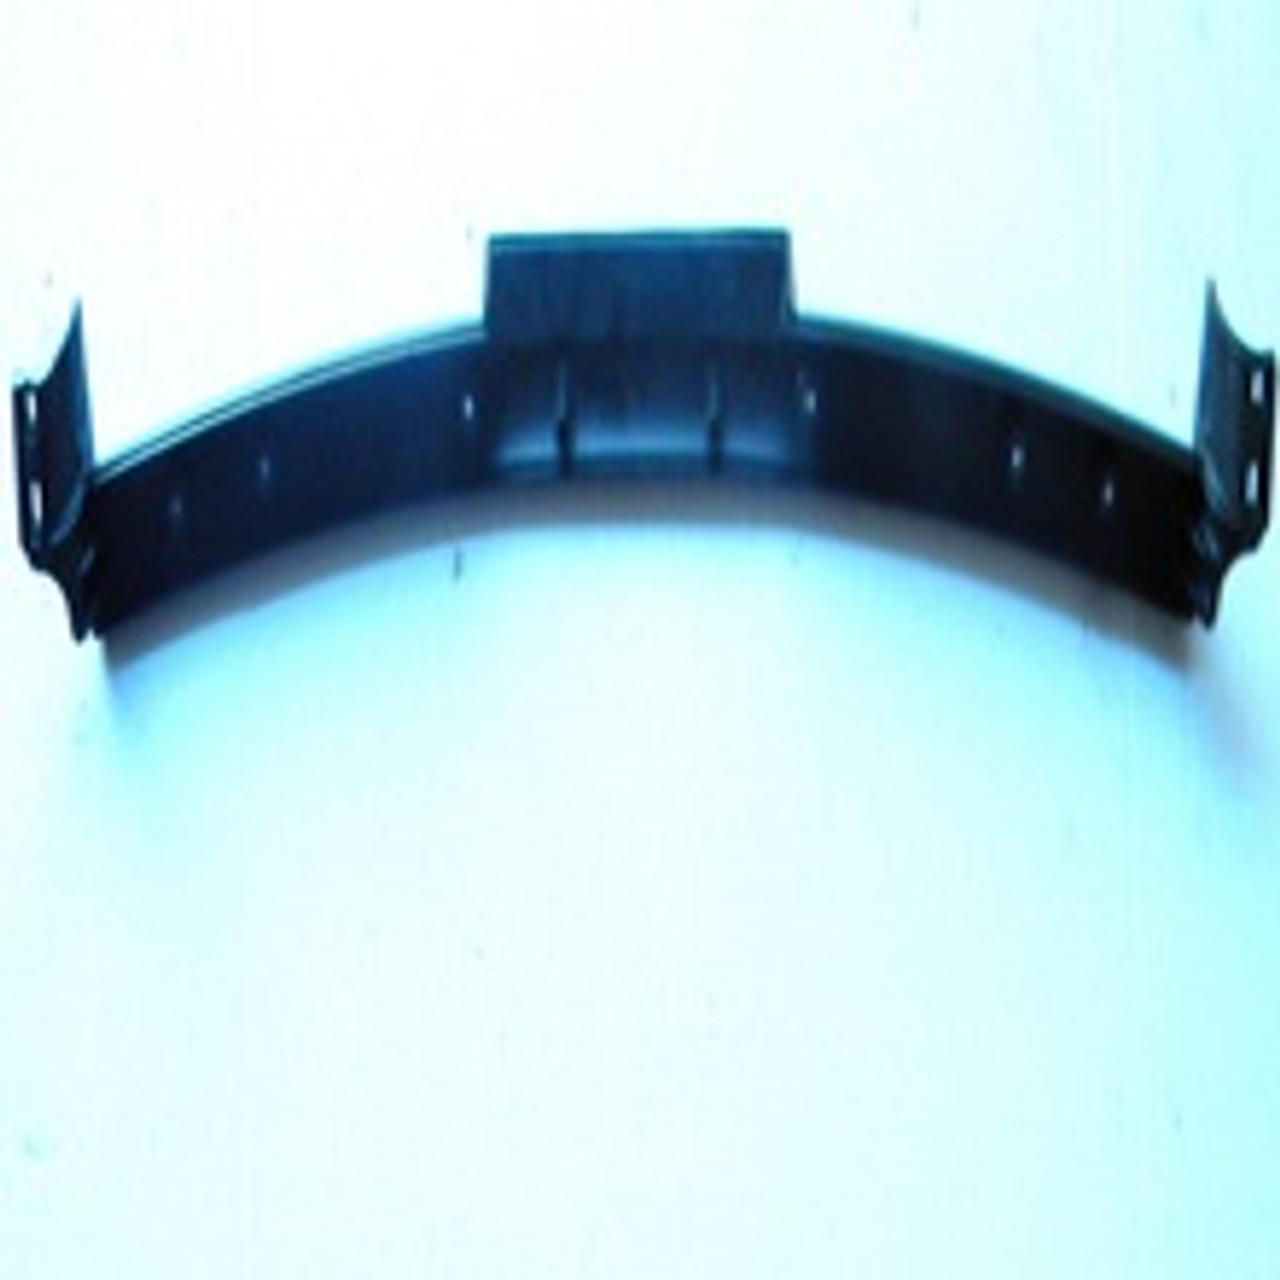 Sears Nordic Track Treadmill Model 249750 T5 LV Pulse Bar Part 283678